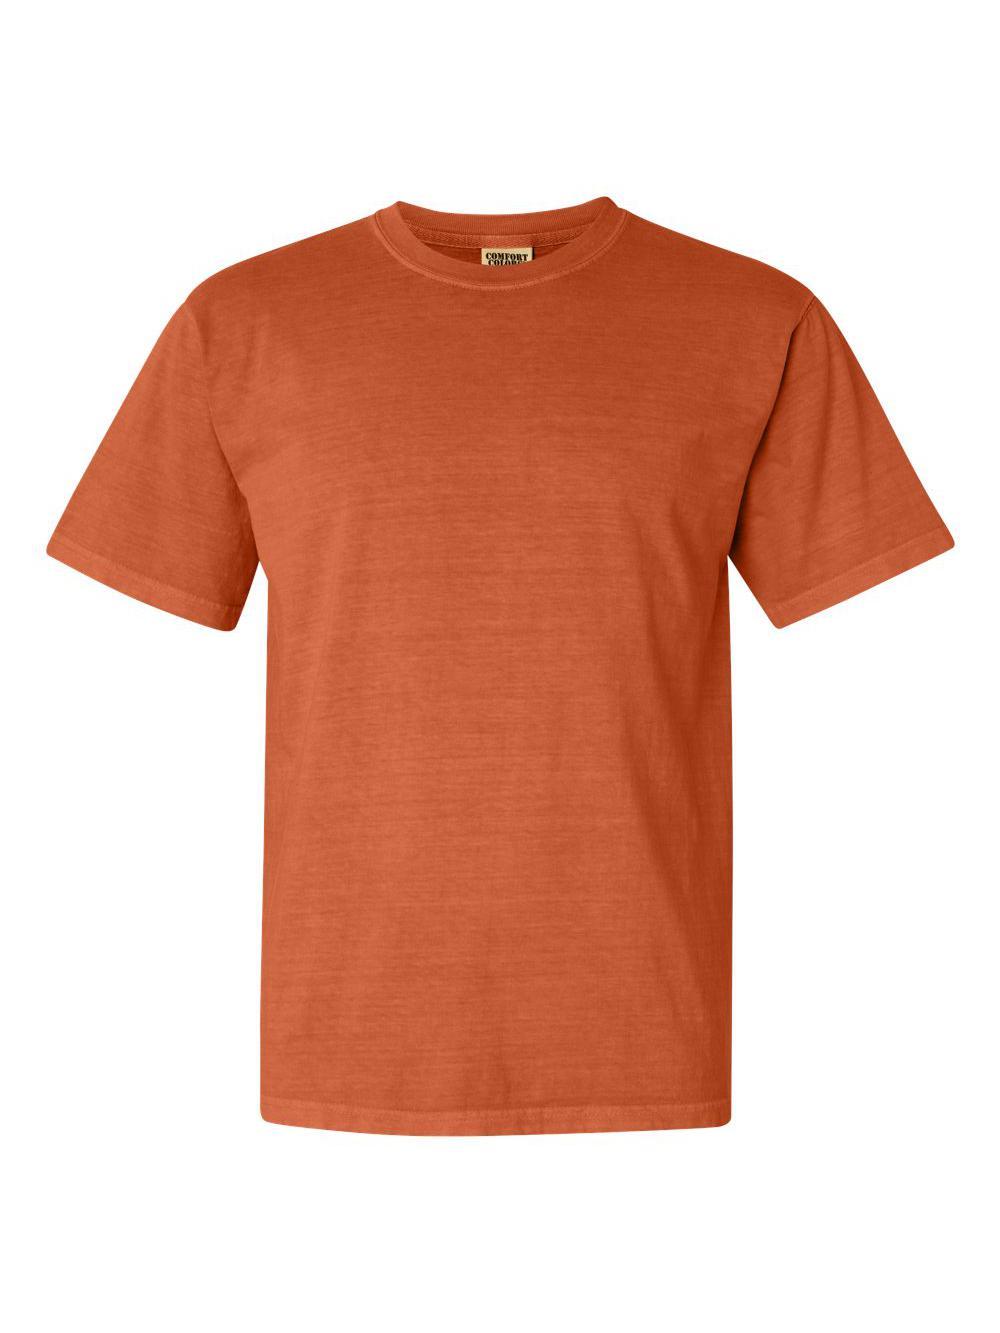 Comfort-Colors-Garment-Dyed-Heavyweight-Ringspun-Short-Sleeve-Shirt-1717 thumbnail 24